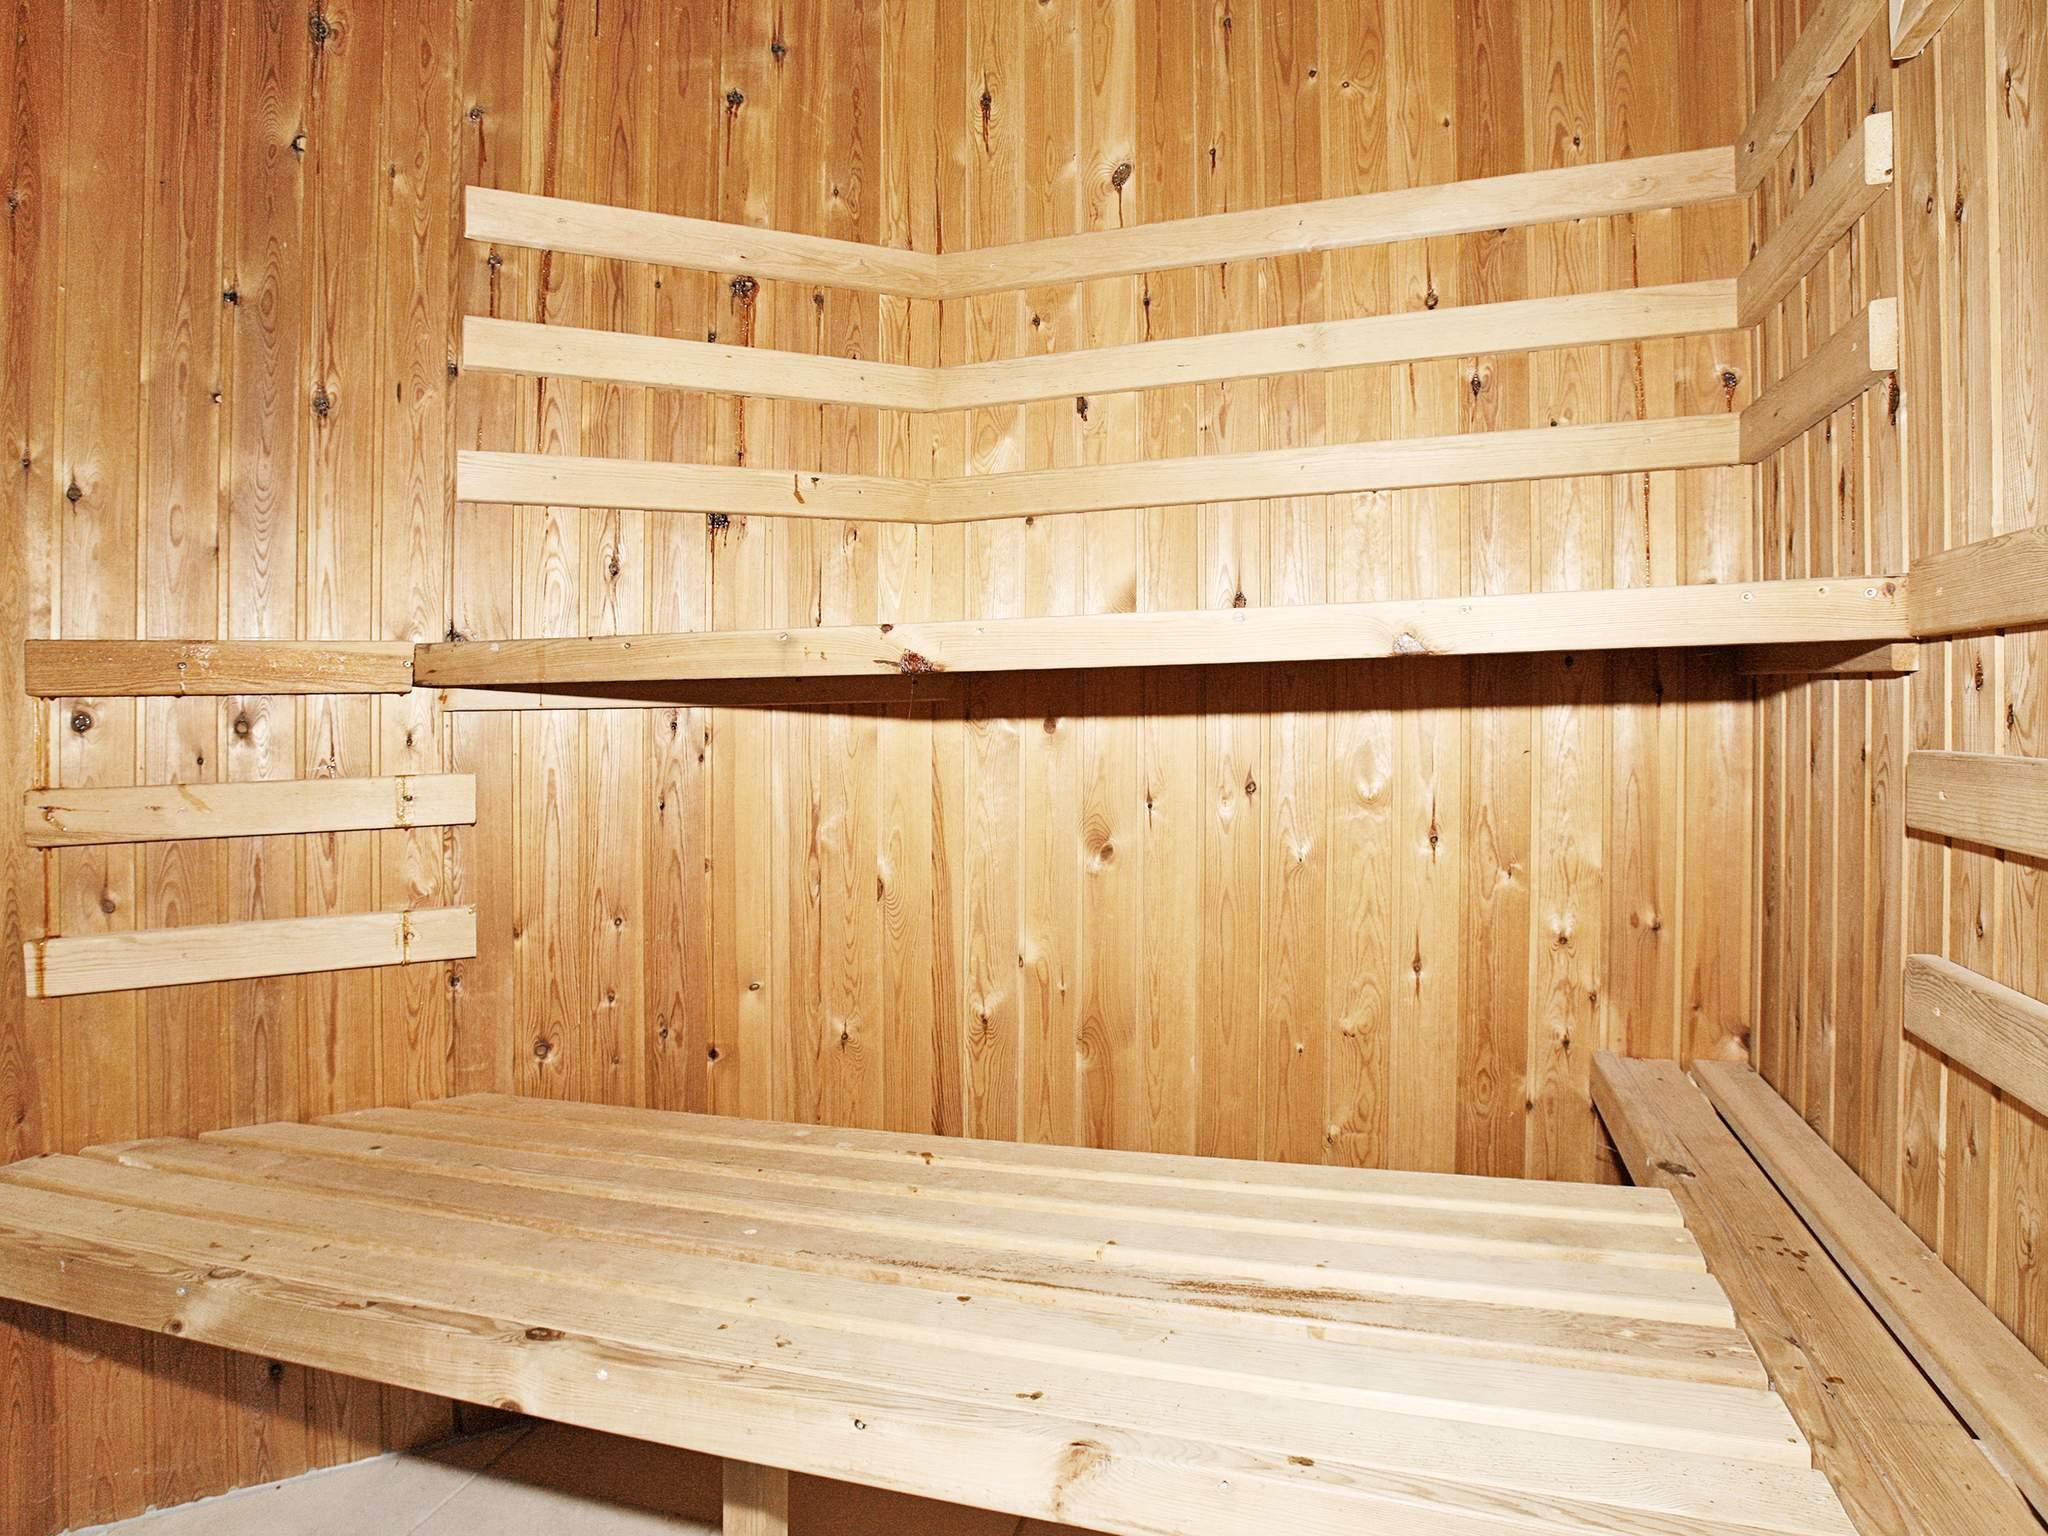 Ferienhaus Vrist (318327), Vrist, , Limfjord, Dänemark, Bild 29